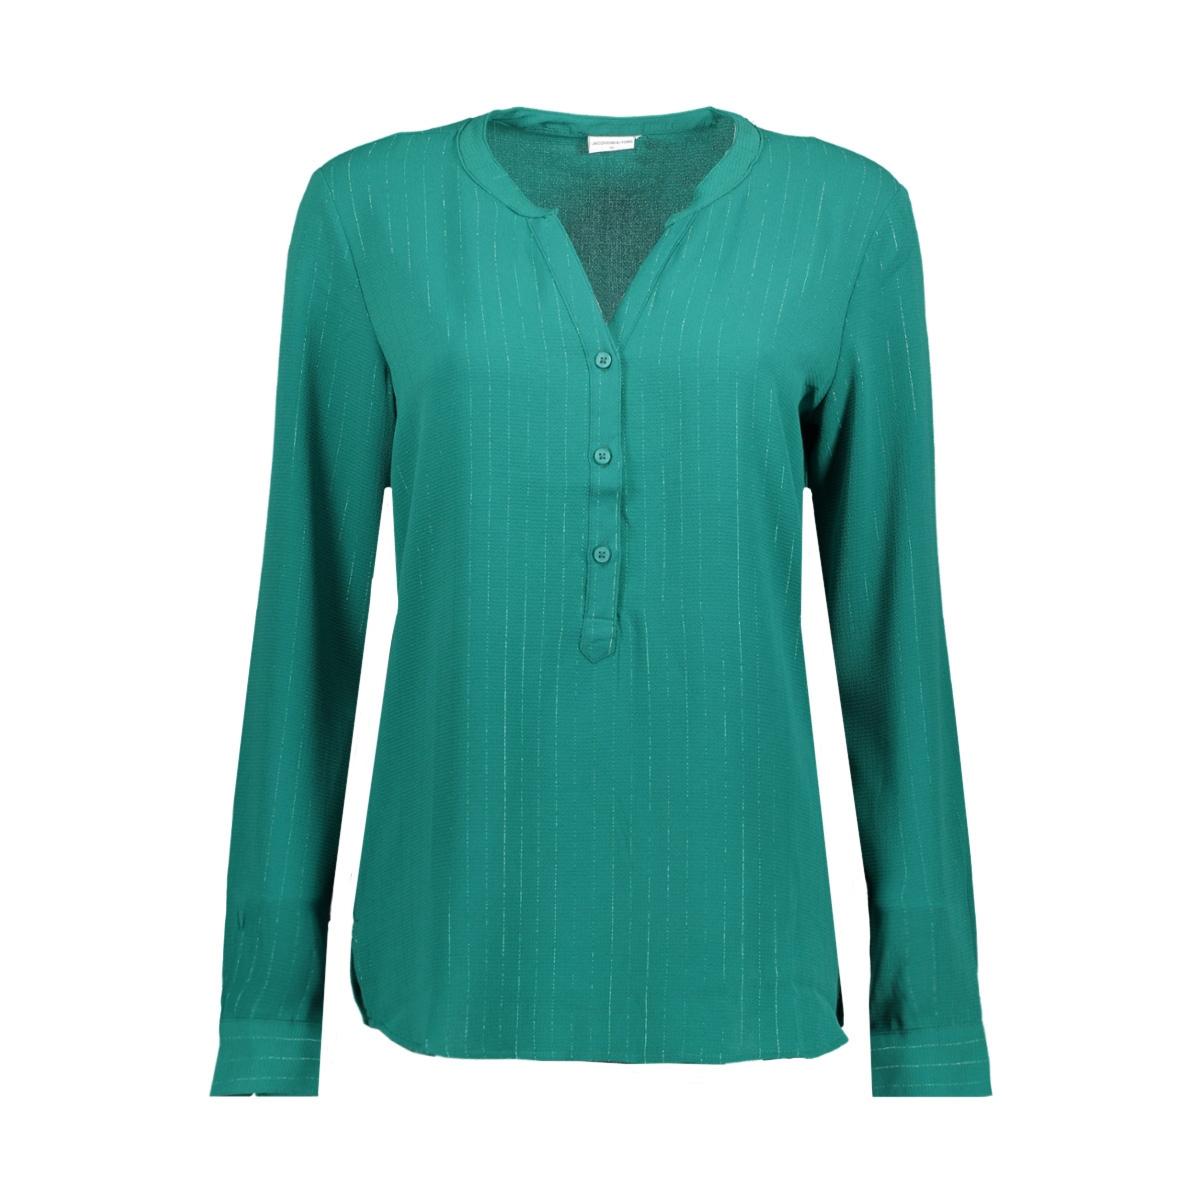 jdyserenity l/s placket top wvn 15142956 jacqueline de yong blouse strom/gun metal